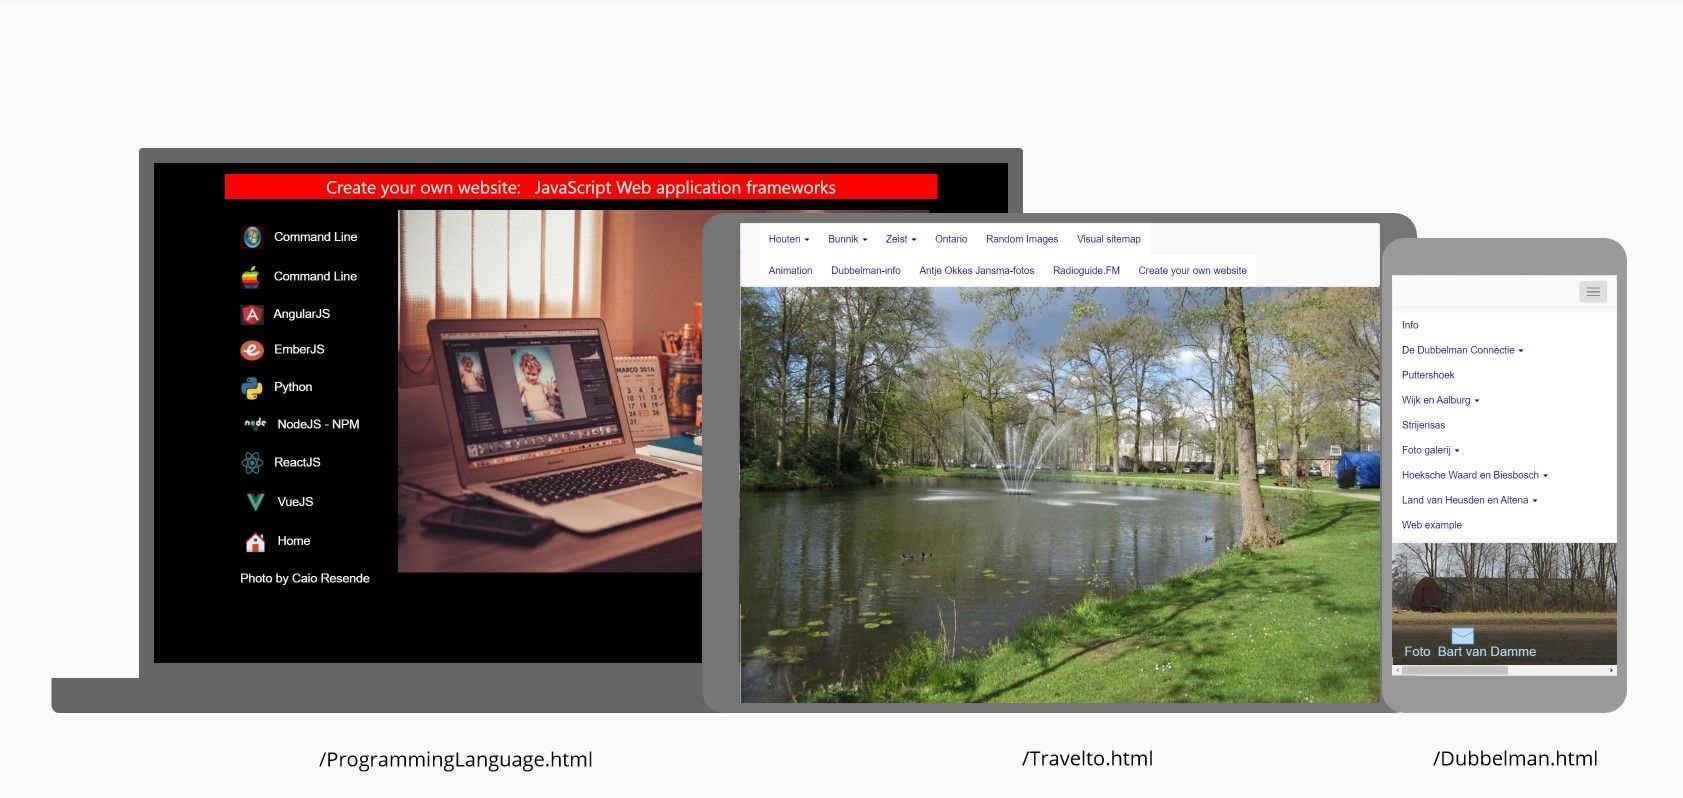 Programminglanguage.html - Travelto.html - Dubbelman.html